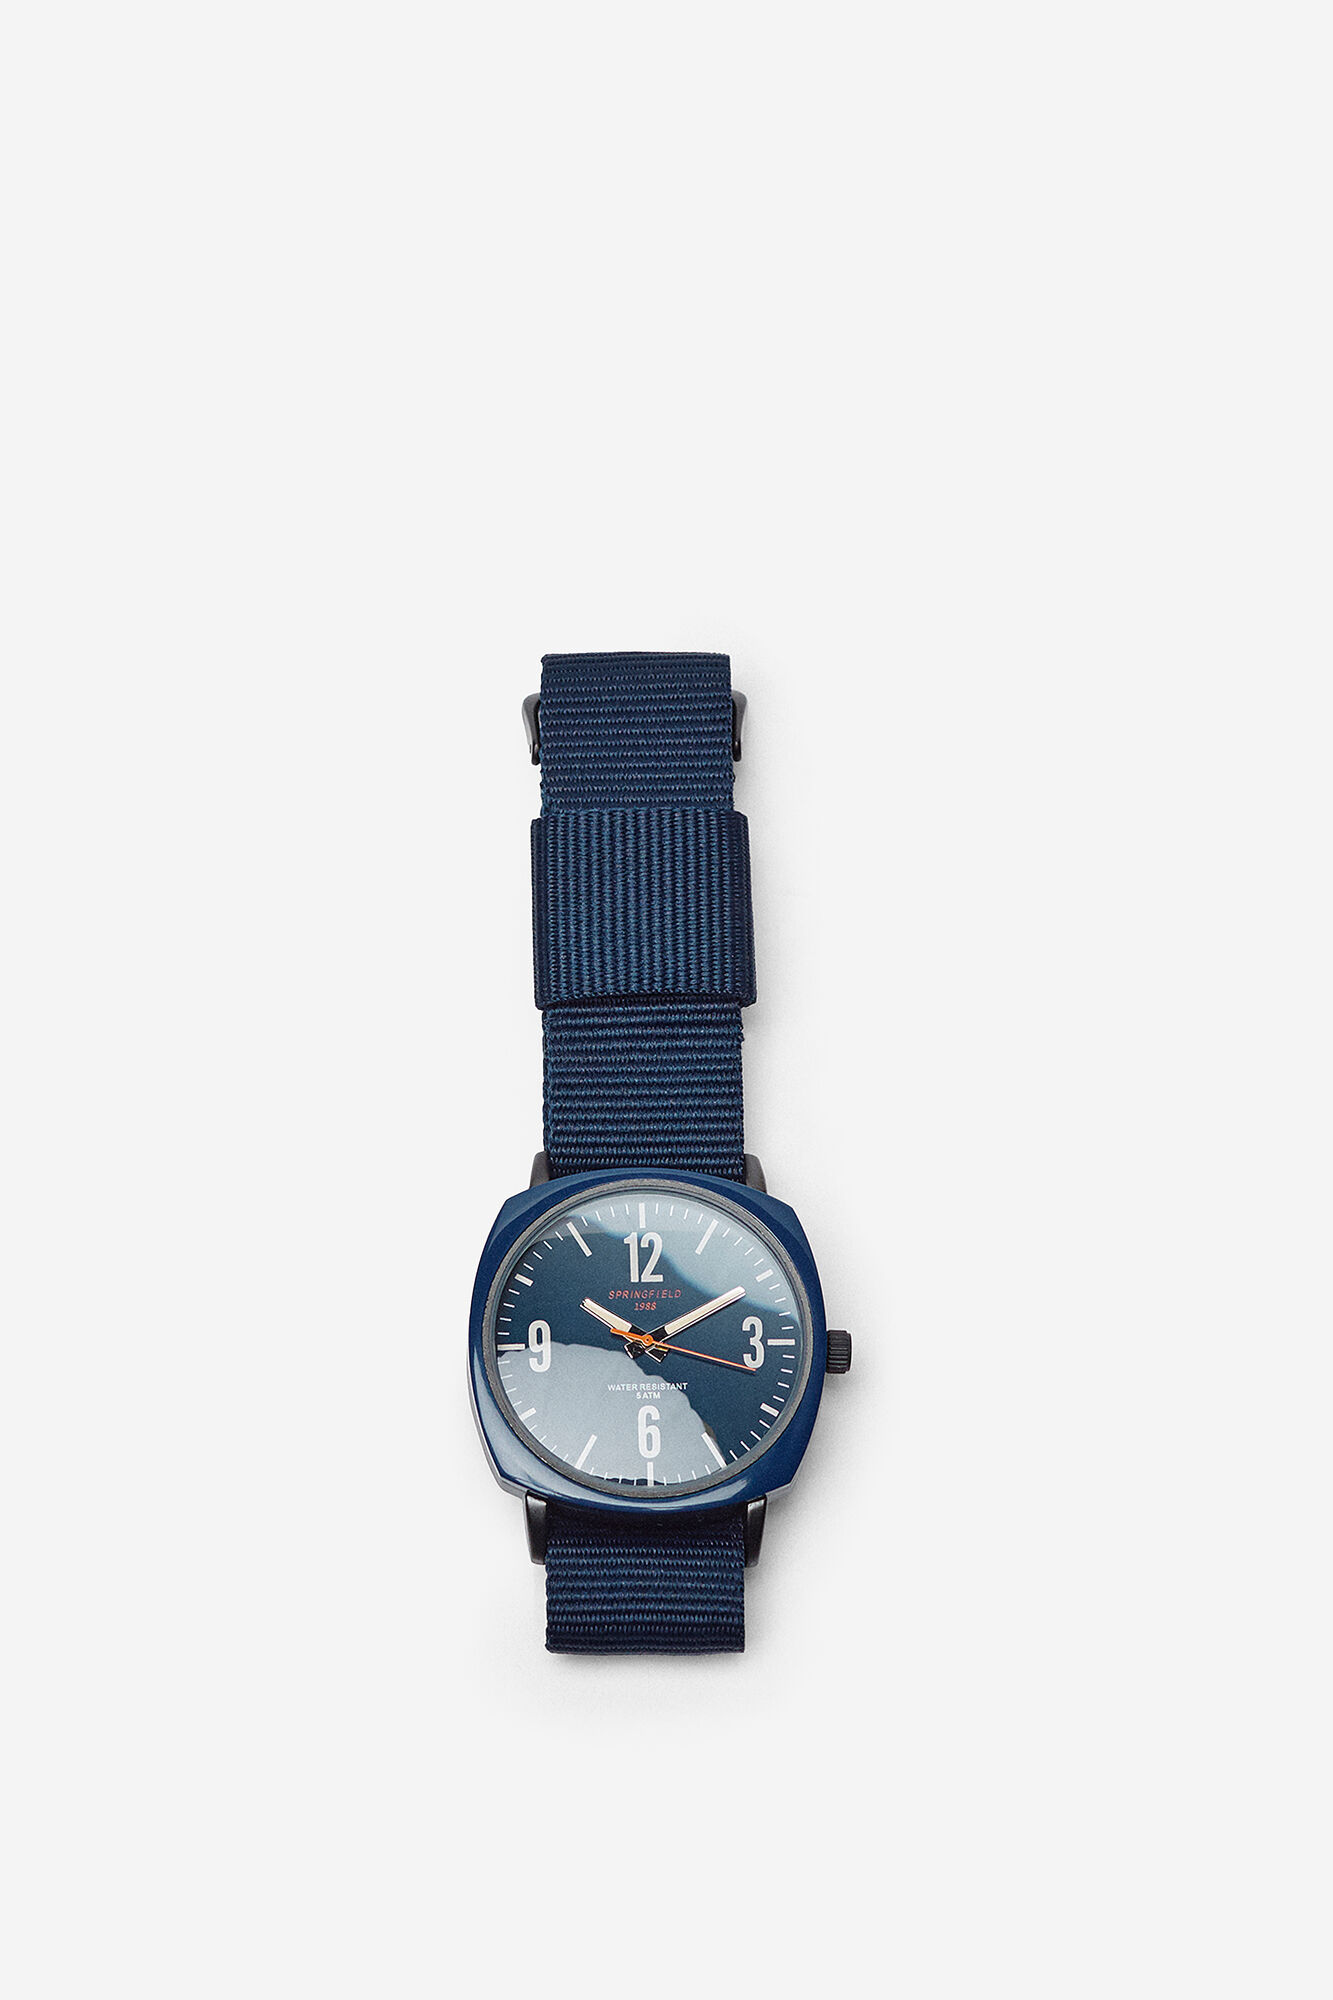 Reloj Caja Cuadrada Total Reloj Blue Caja jSVLzpqUMG